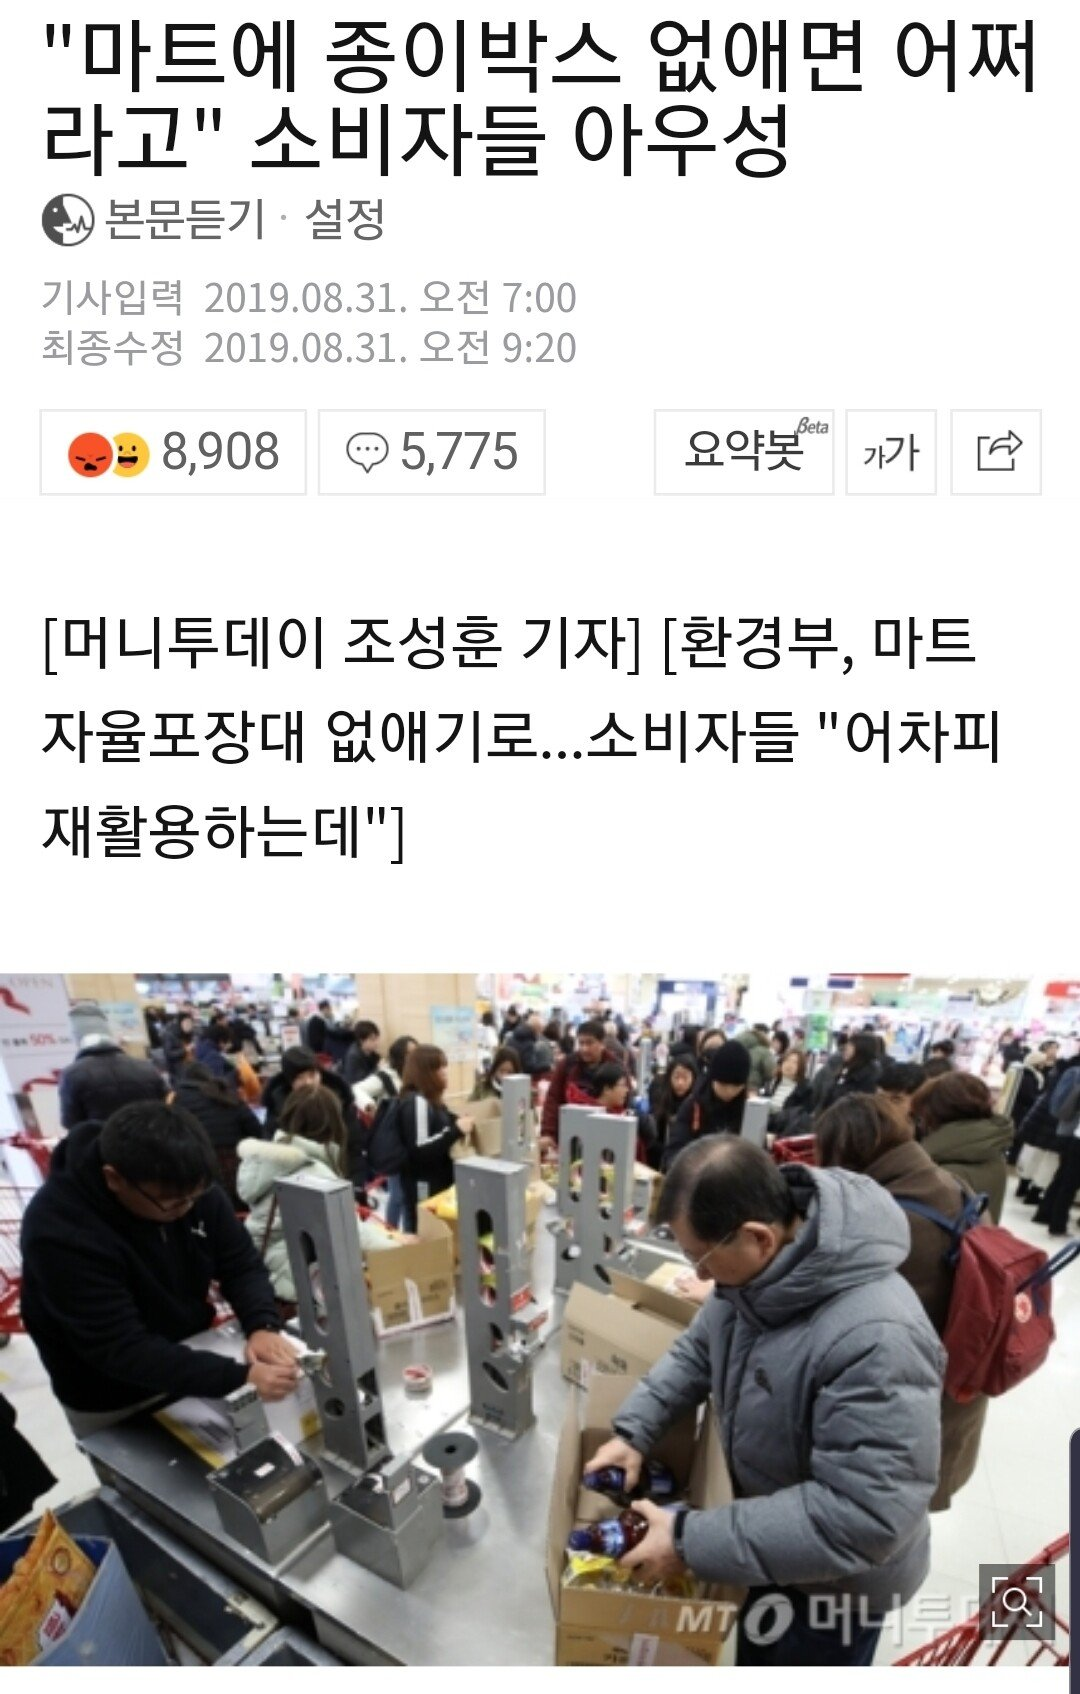 Screenshot_20190901-080743_Samsung Internet.jpg 올해 탁상행정 레전드